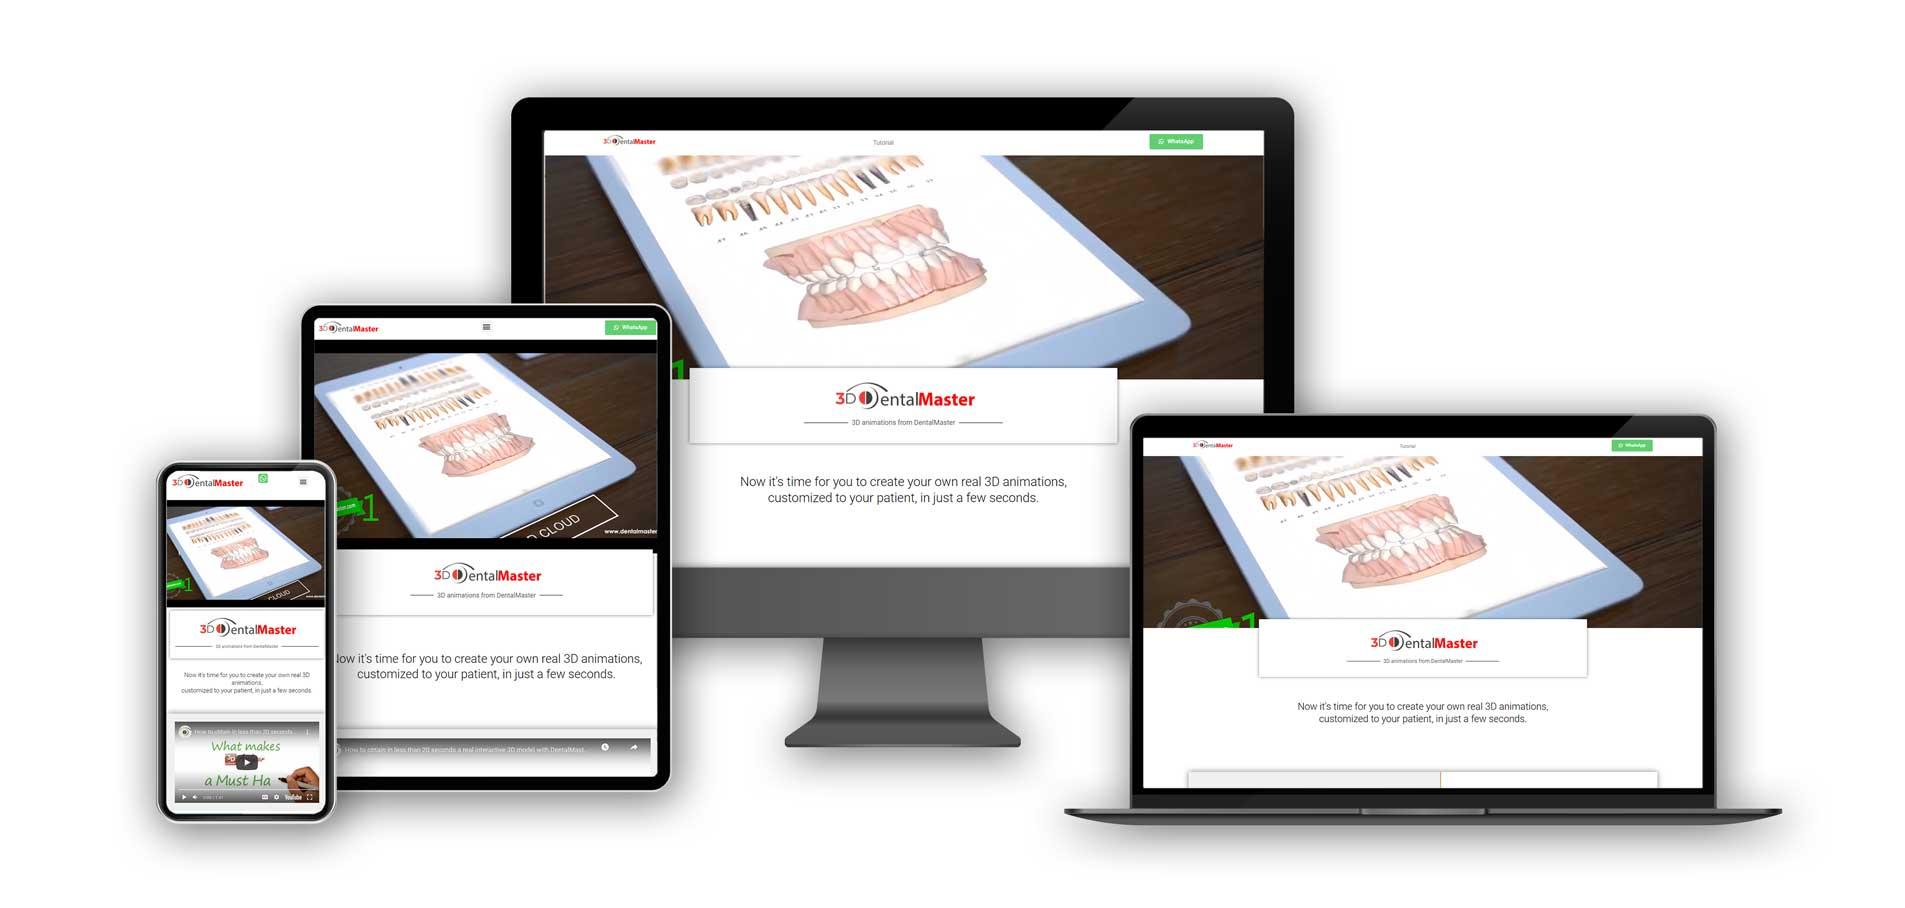 3d-DentalMaster website on various screens